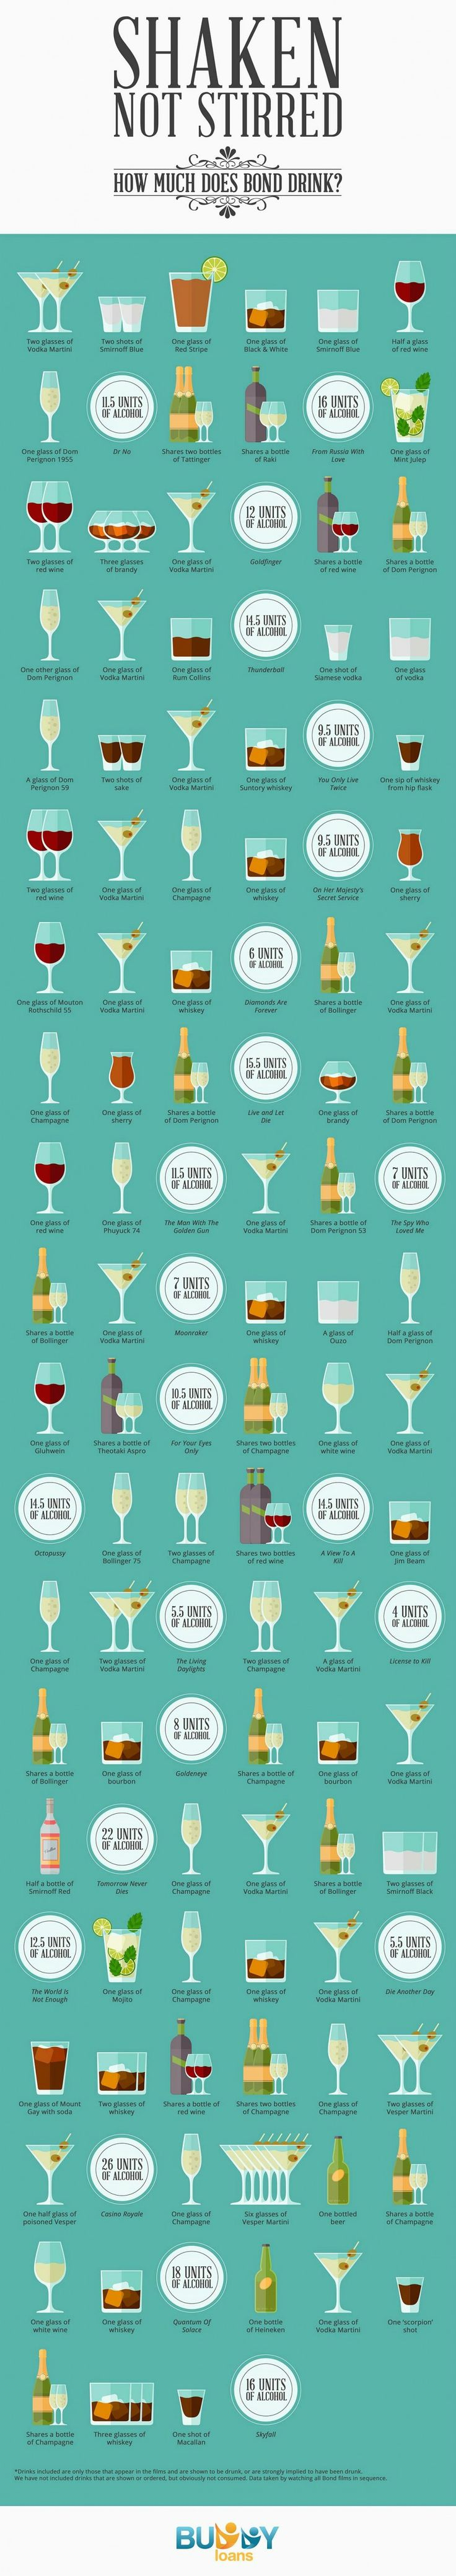 007-drink